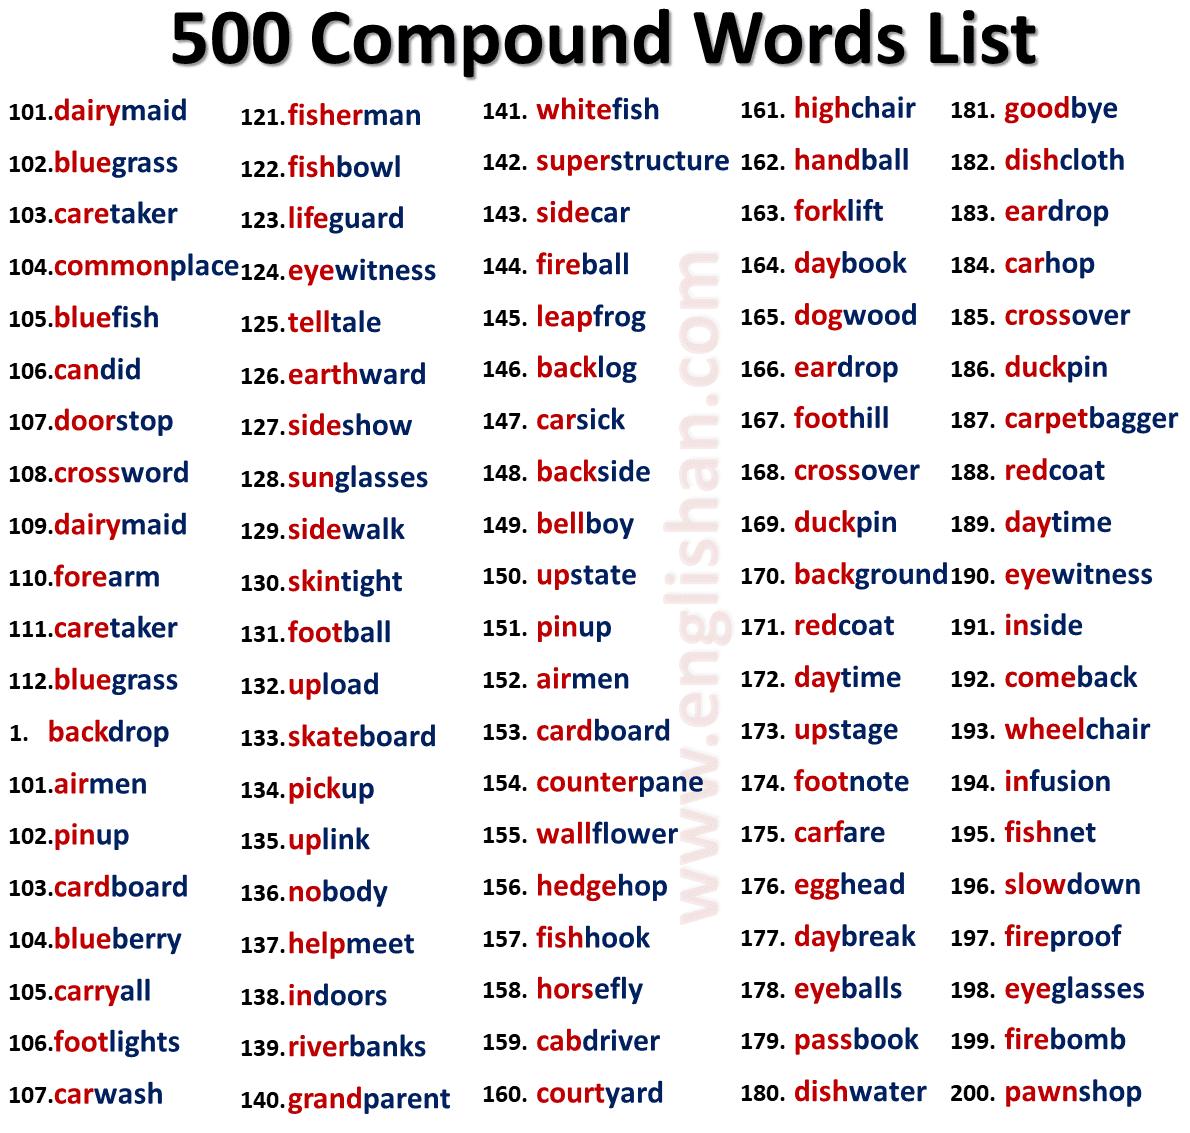 500 Open Compound Words List